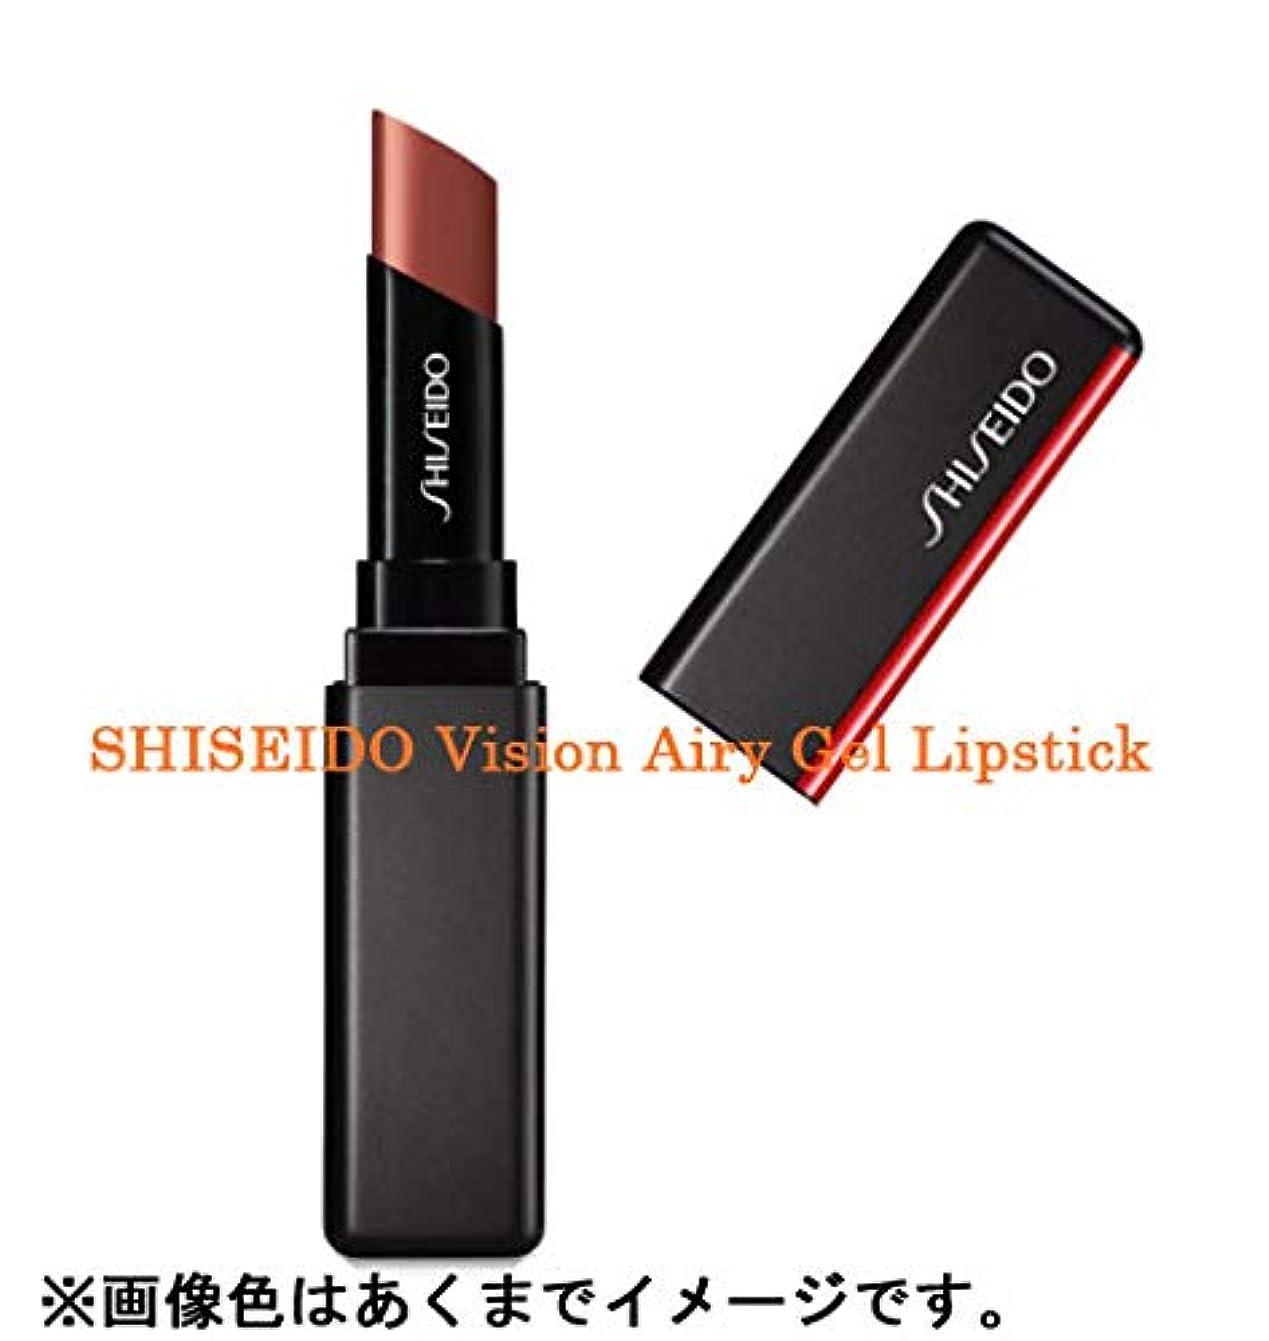 SHISEIDO Makeup(資生堂 メーキャップ) SHISEIDO(資生堂) SHISEIDO ヴィジョナリー ジェルリップスティック 1.6g (204)